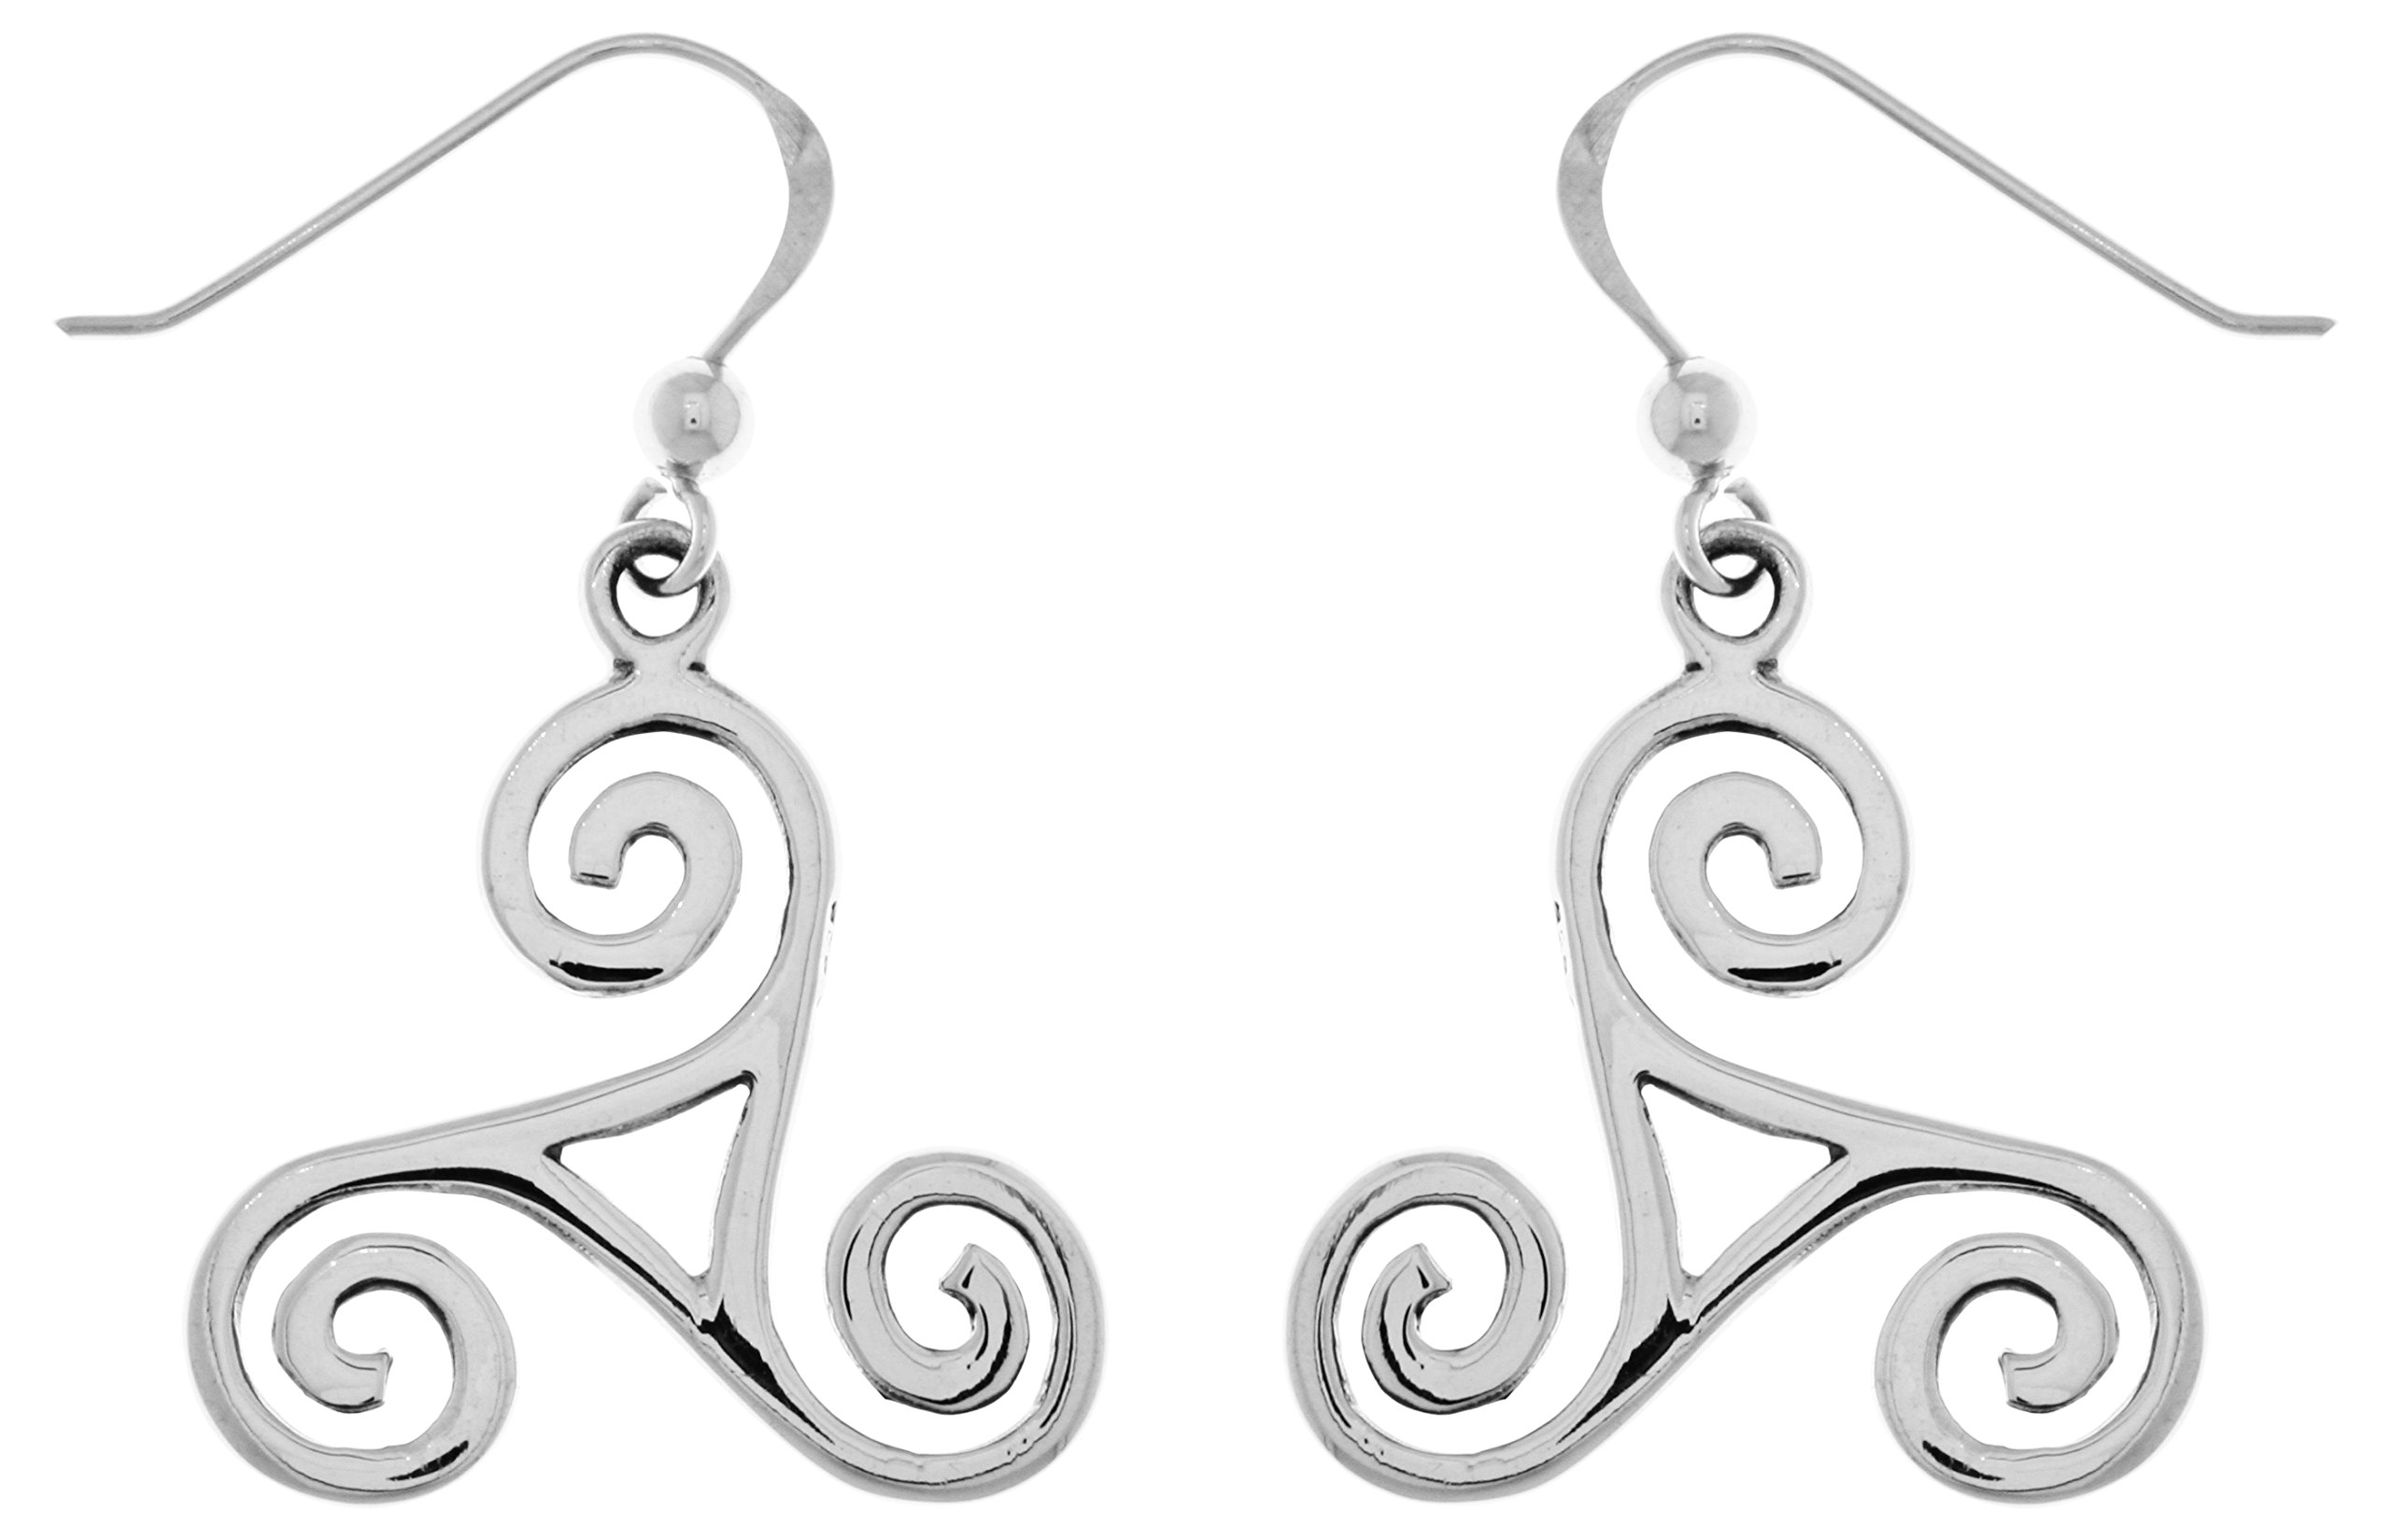 Jewelry Trends Spiral Triskele Celtic Trinity Knot Sterling Silver Dangle Earrings